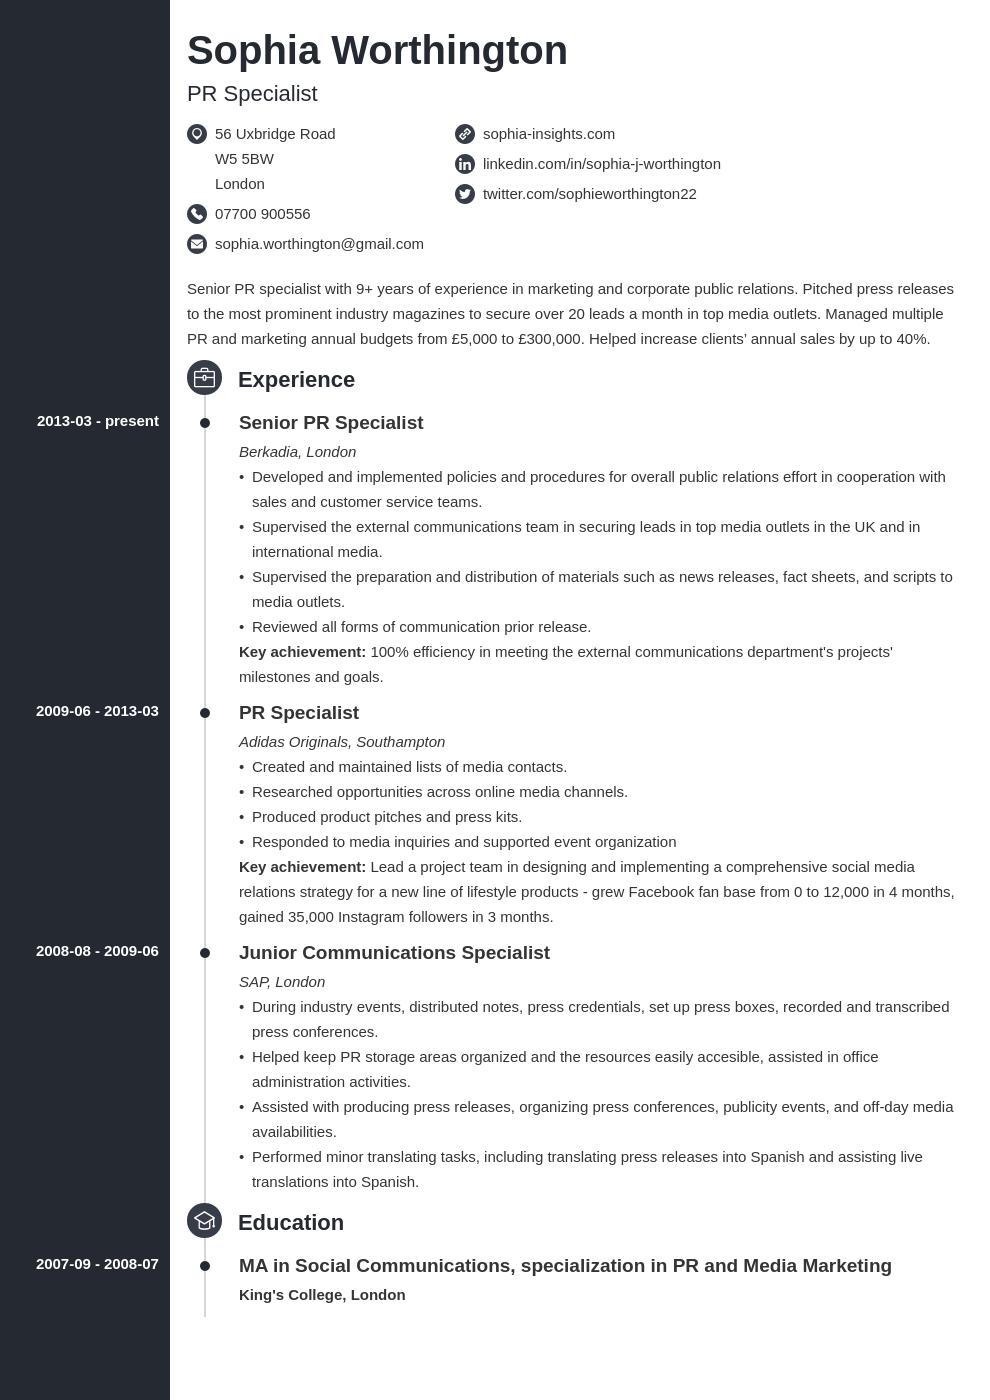 cv personal statement profile template concept in 2020